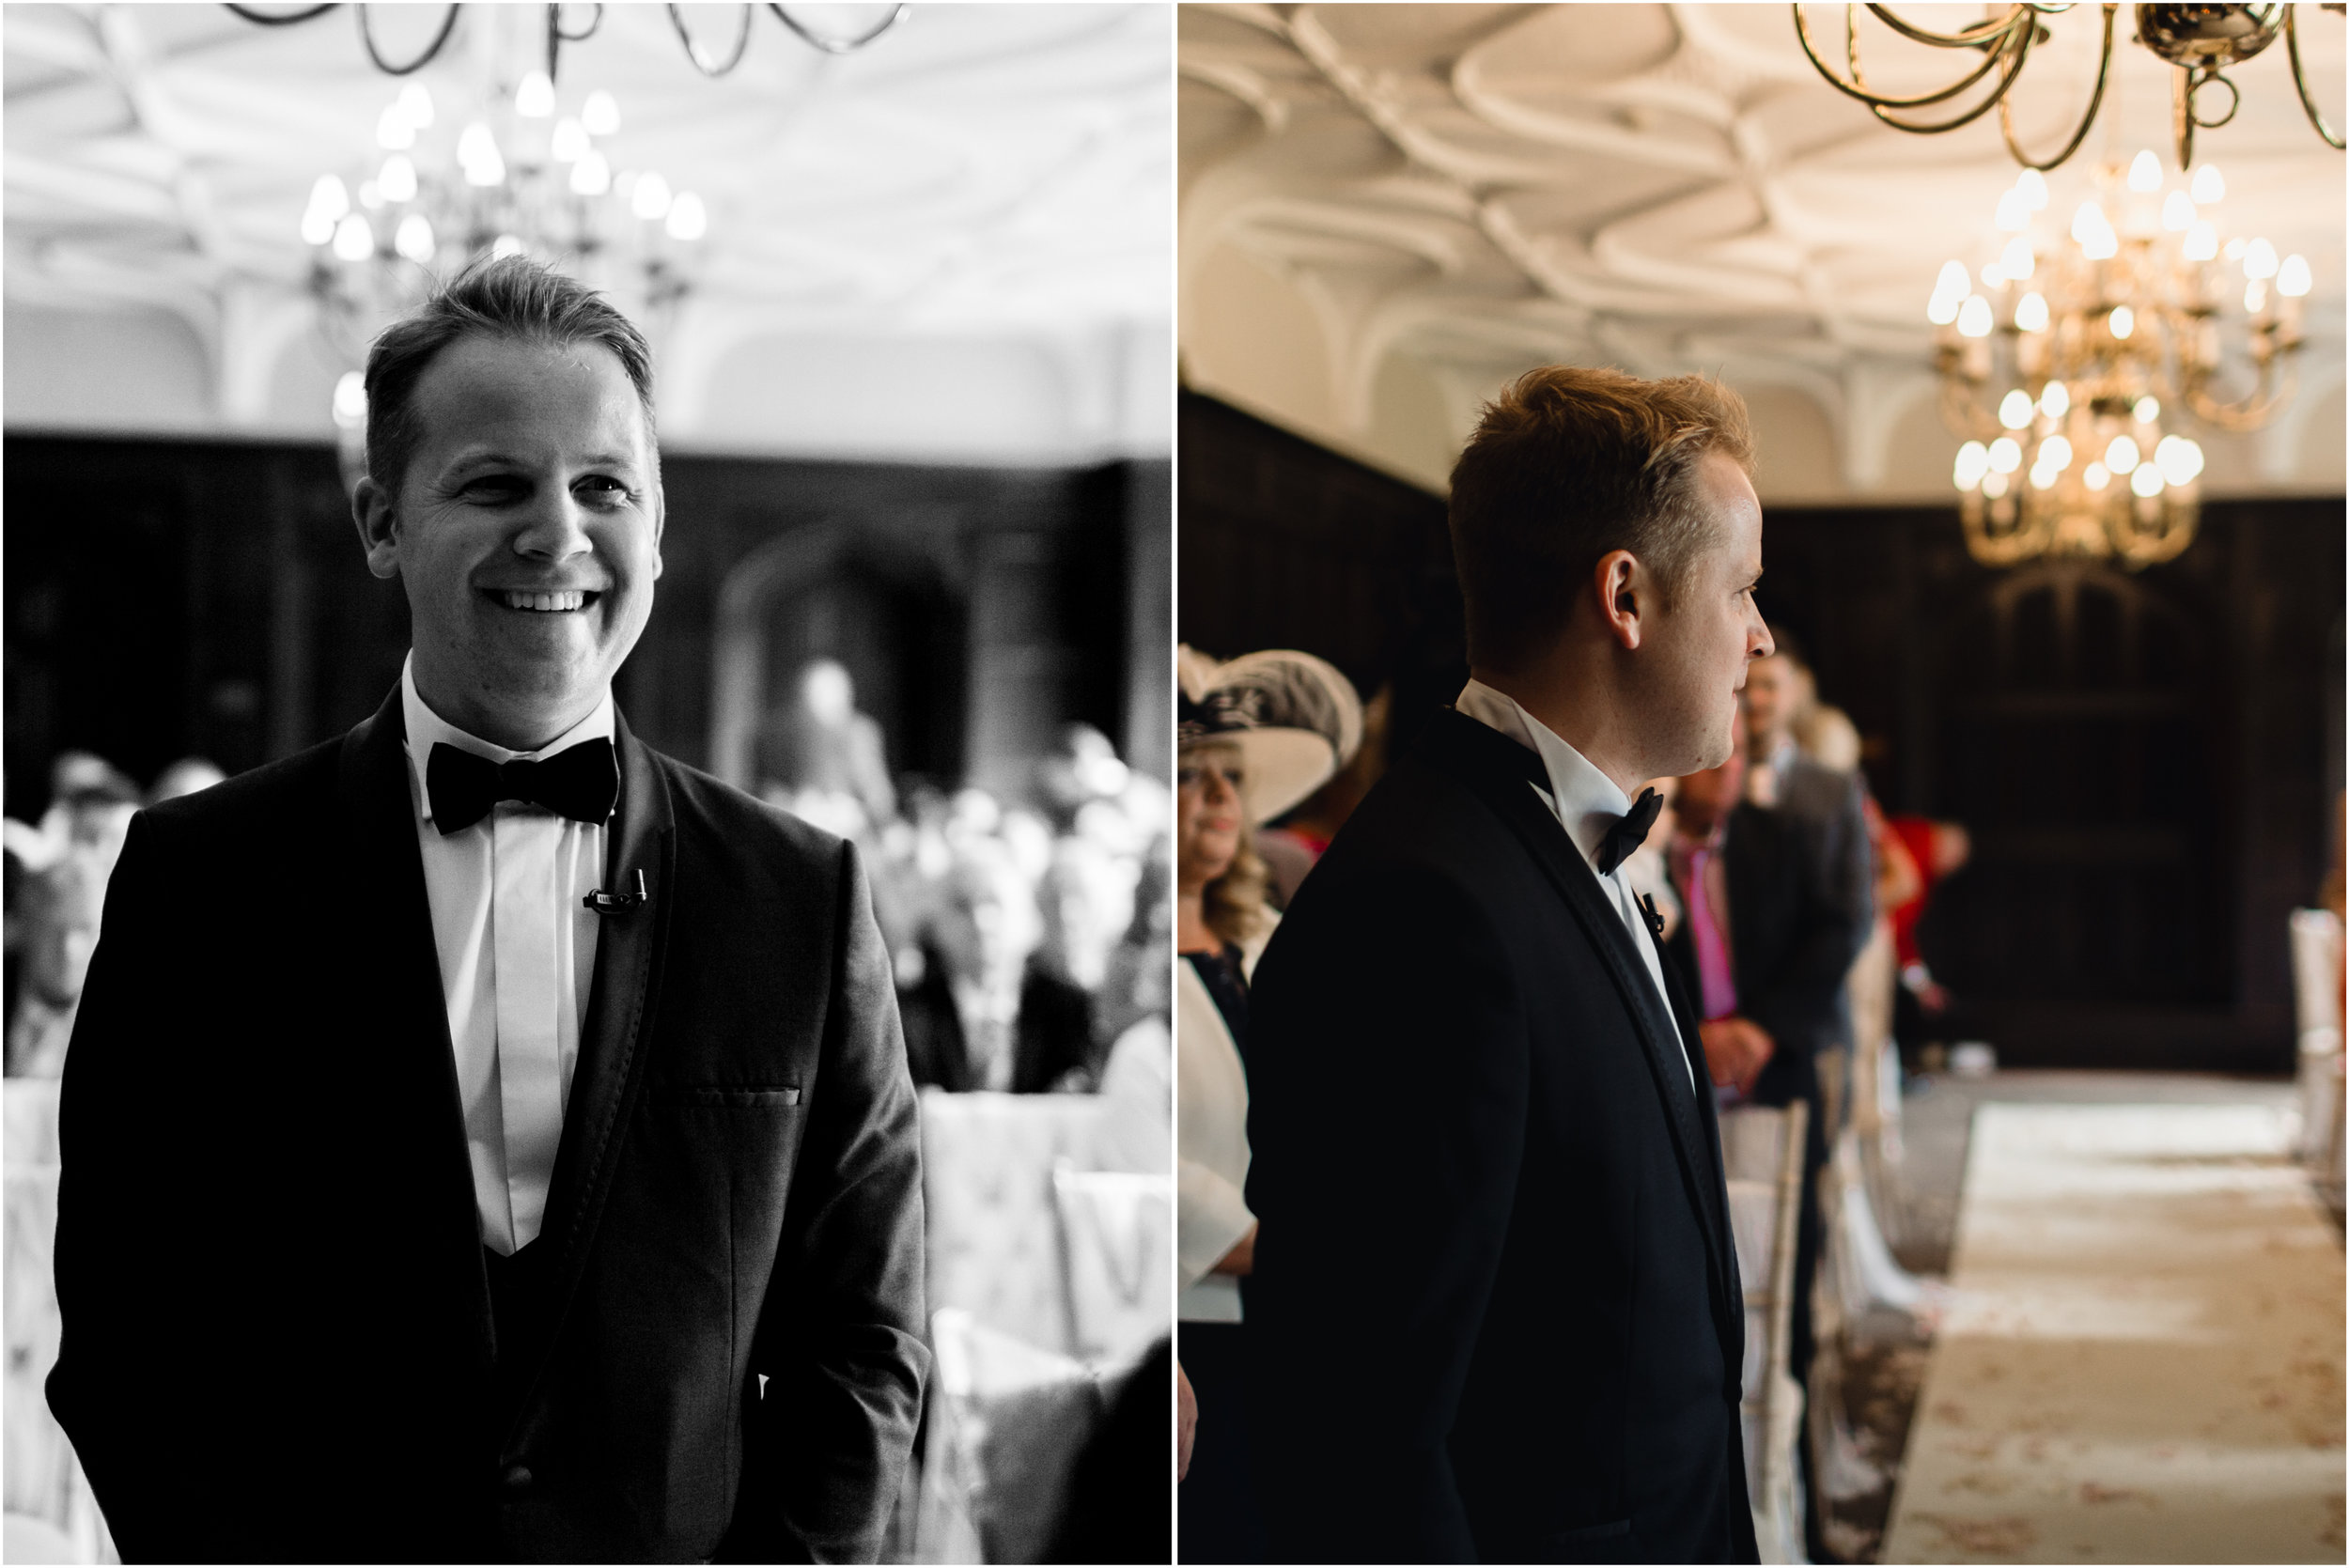 Rebecca Searle Wedding Photography Surrey London Luxury 36.jpg